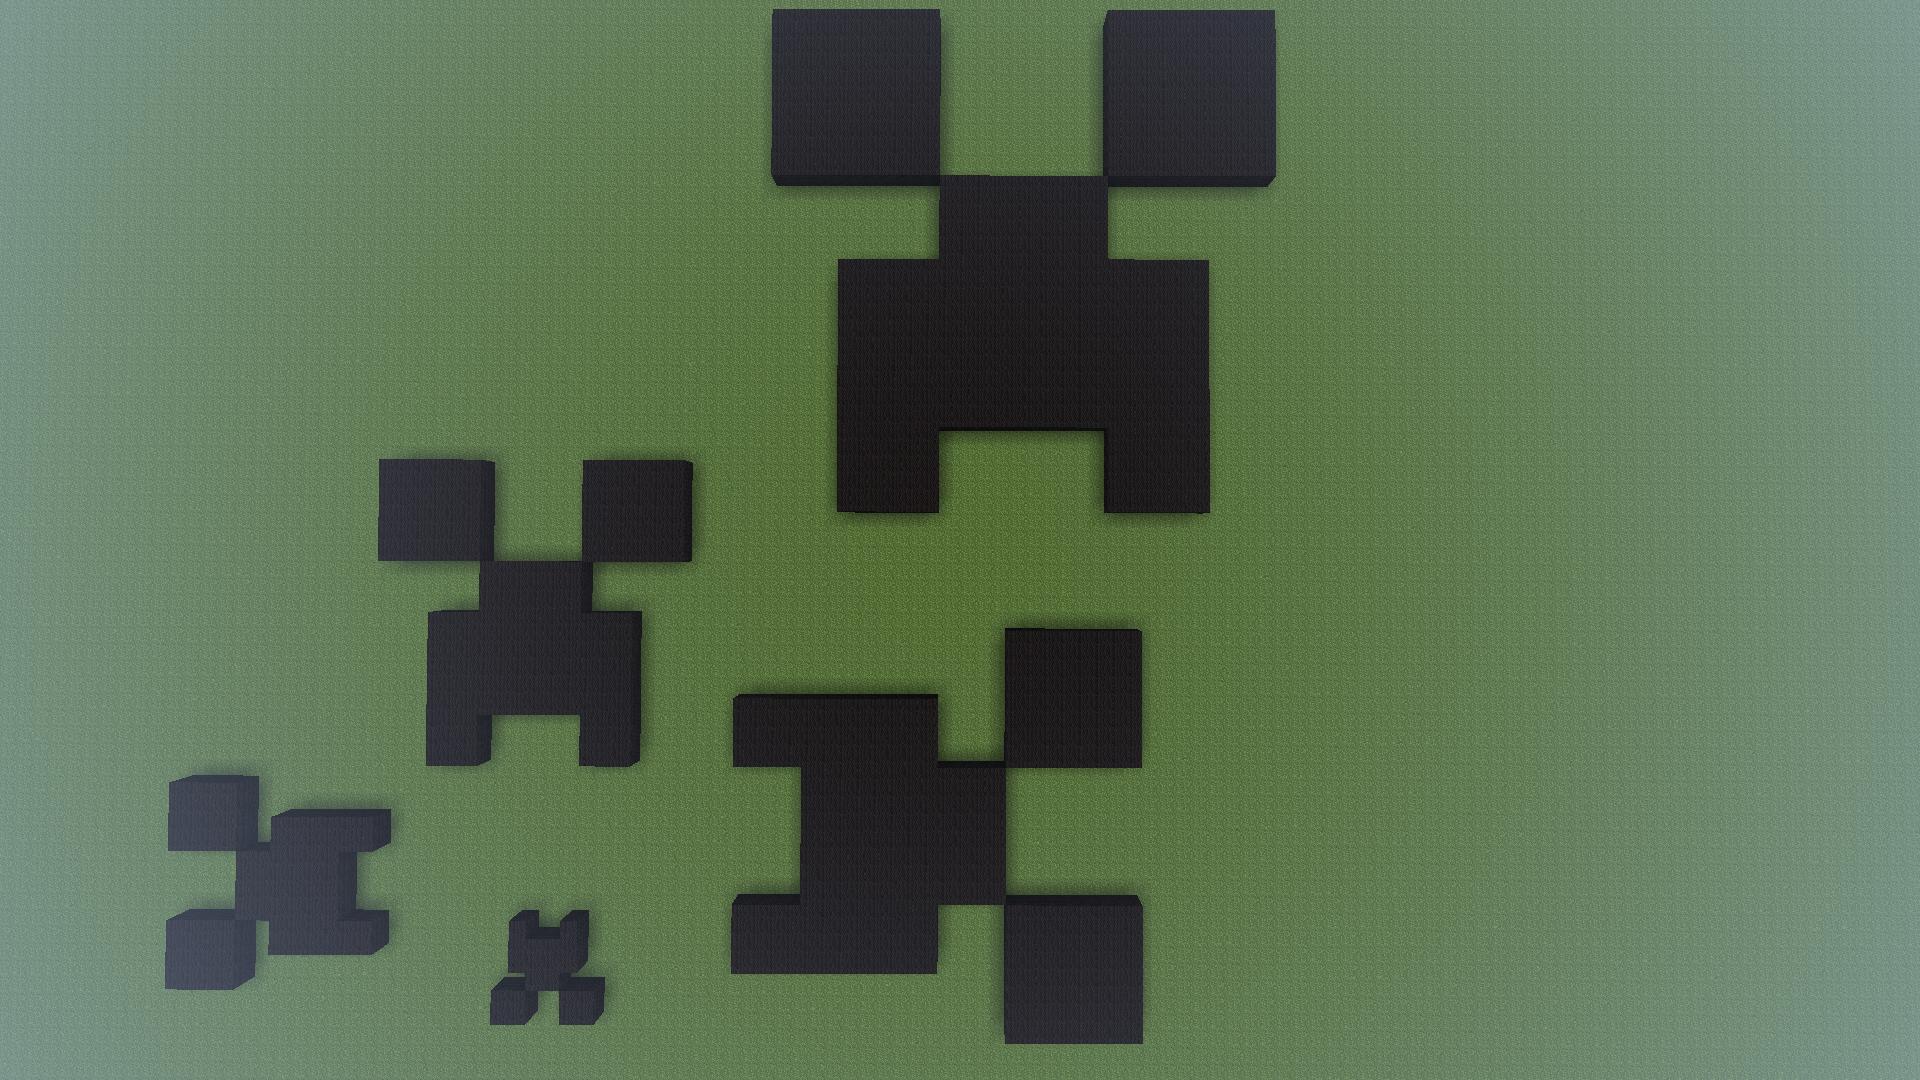 картинки на рабочий стол крипера из майнкрафт #4